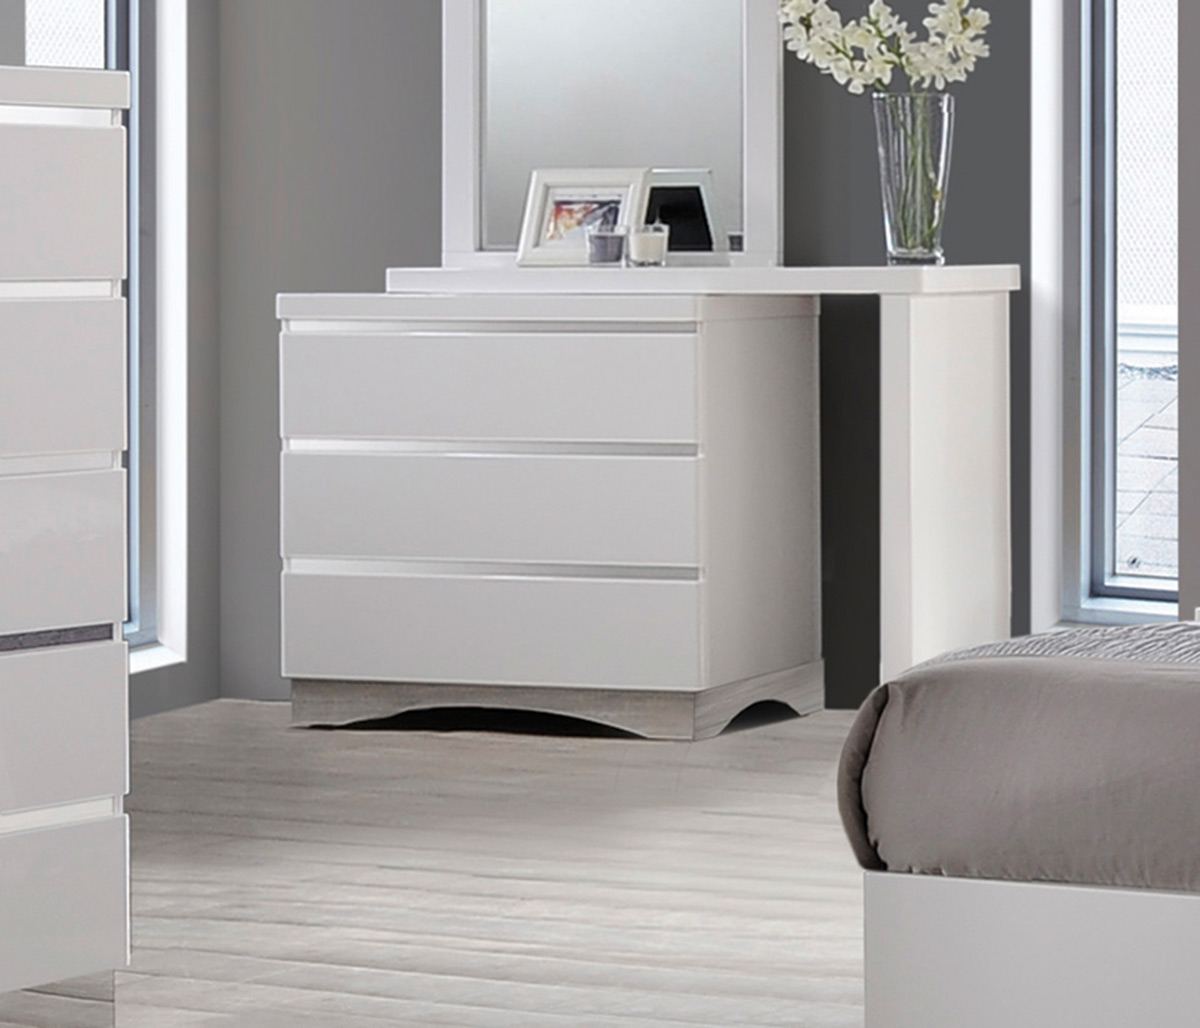 Coaster Alessandro Dresser   Glossy White. Coaster Alessandro Dresser   Glossy White 205003 at Homelement com